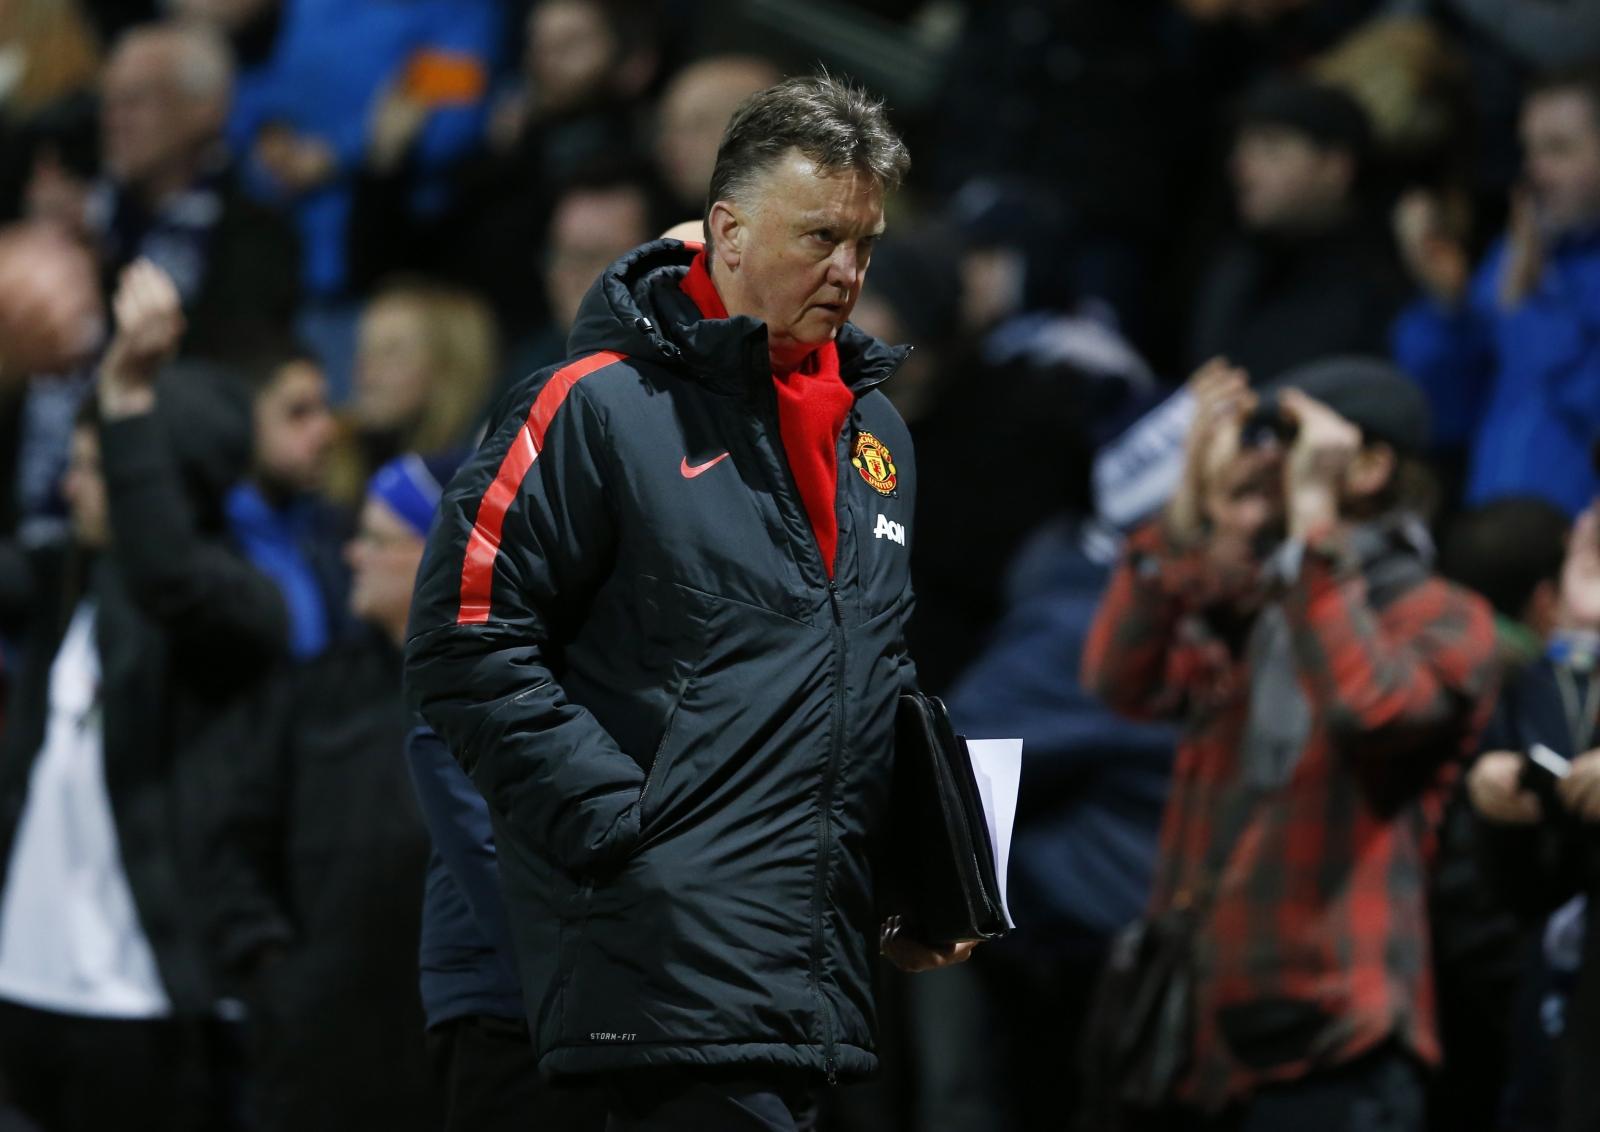 Louis van Gaal takes credit for Manchester Utd turnaround